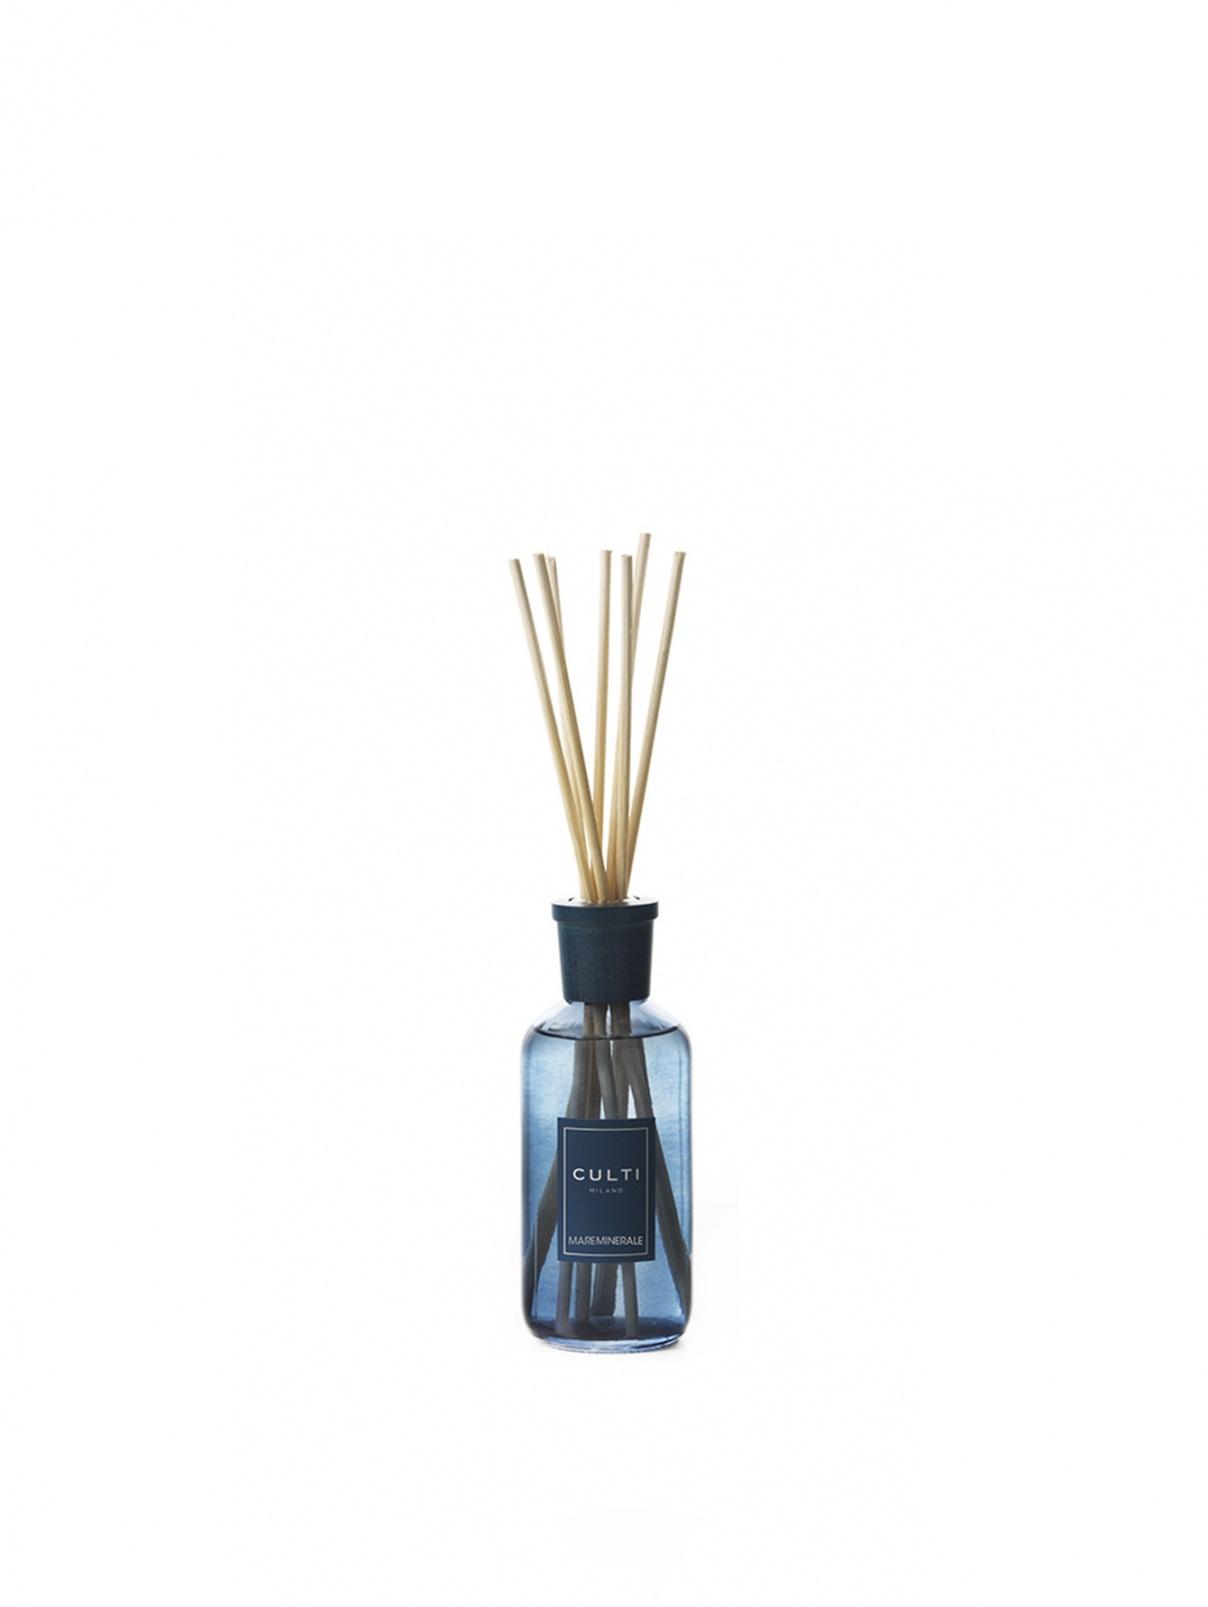 Stile Colours Blue диффузор Mareminerale 250 мл Home Fragrance Culti Milano  –  Общий вид